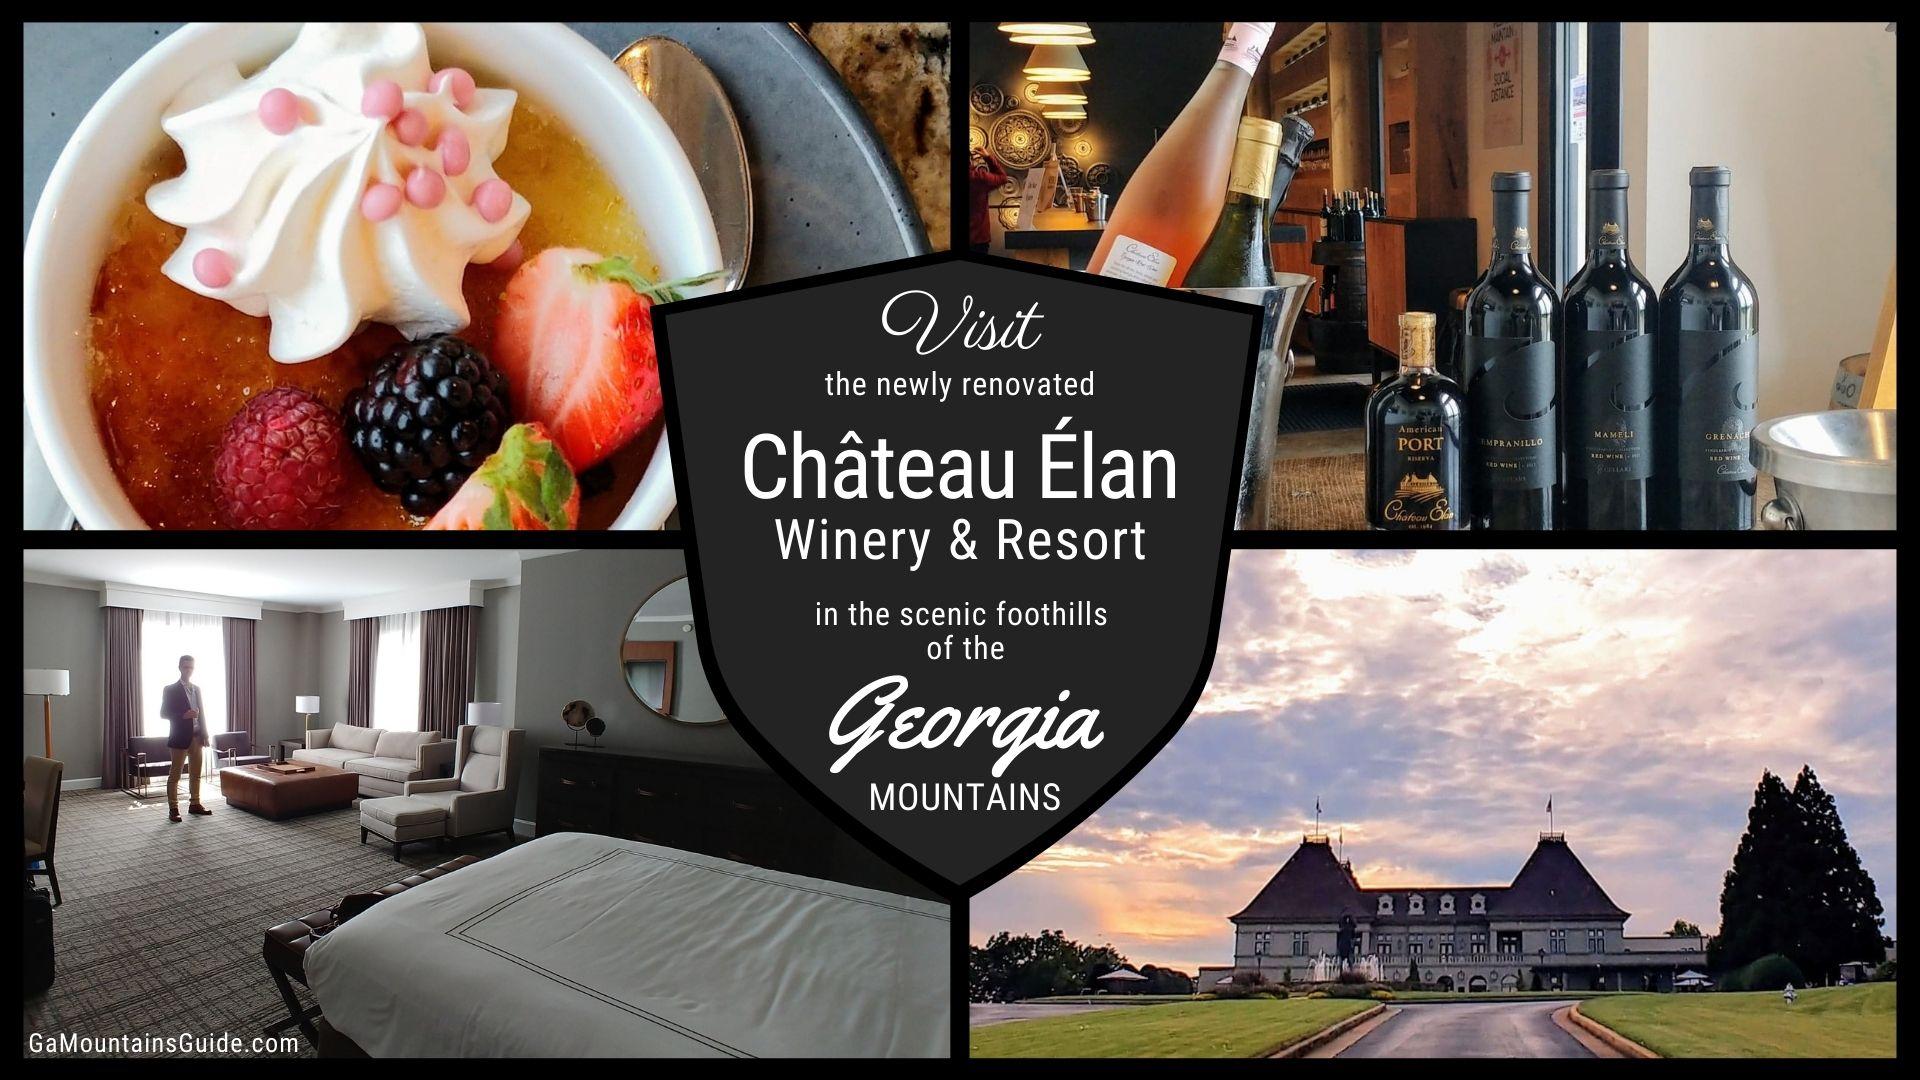 Chateau-Elan-Food-Wine-Resort-2020